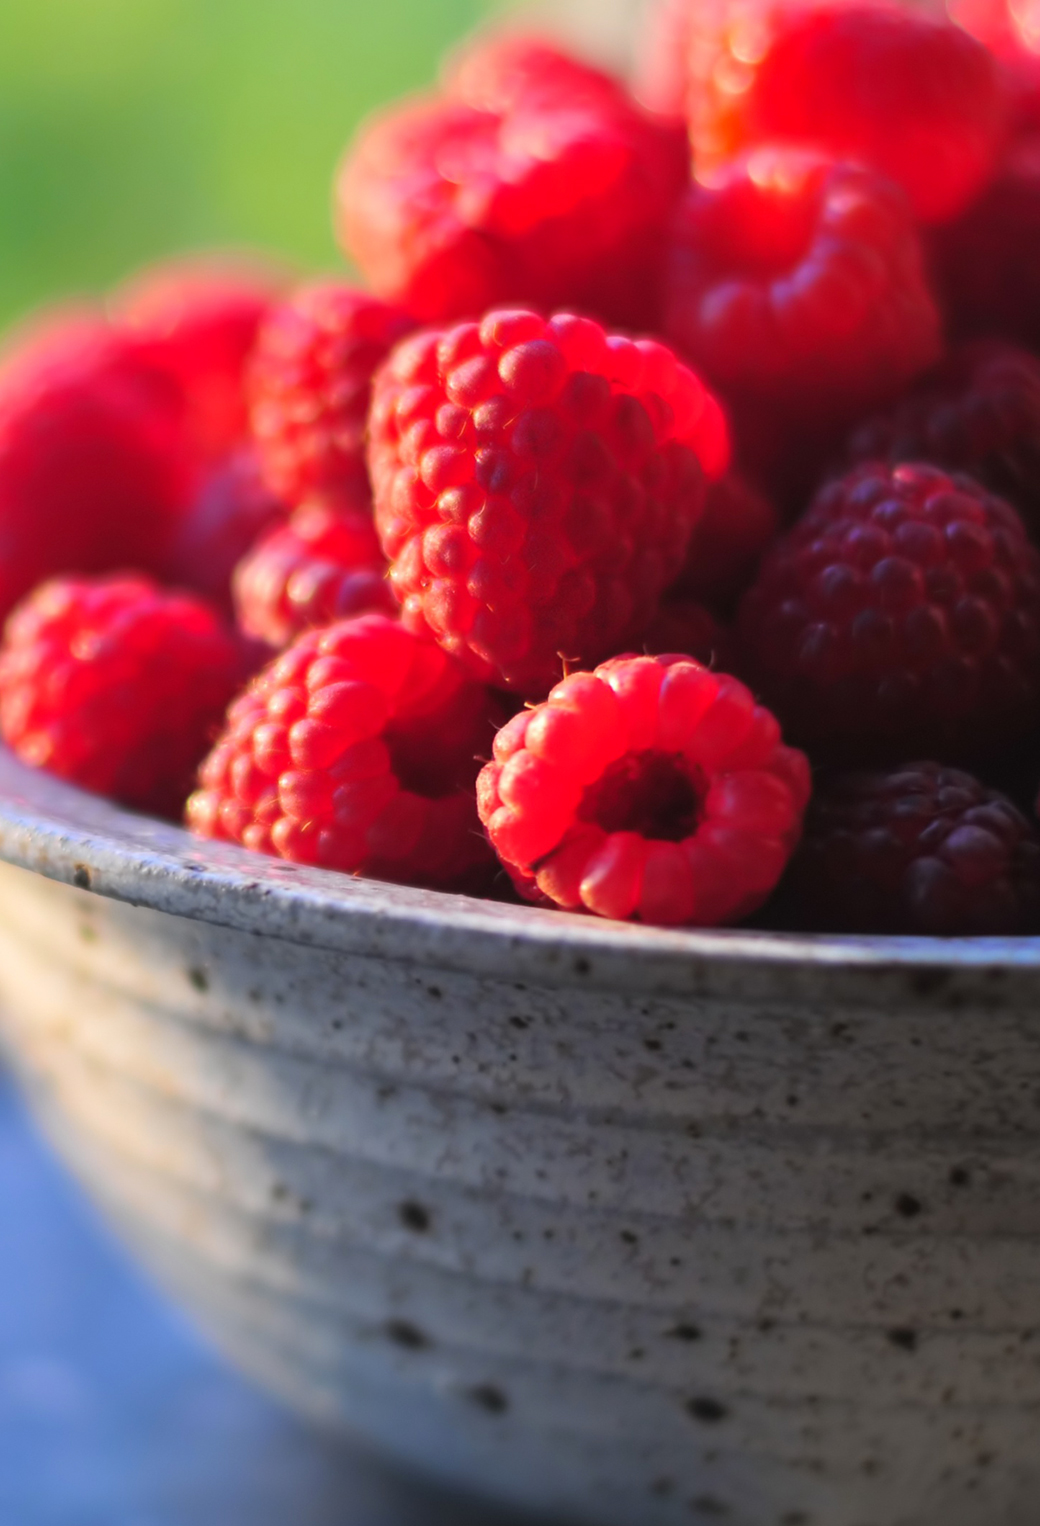 Fresh Raspberries 3Wallpapers iphone Parallax Fresh Raspberries